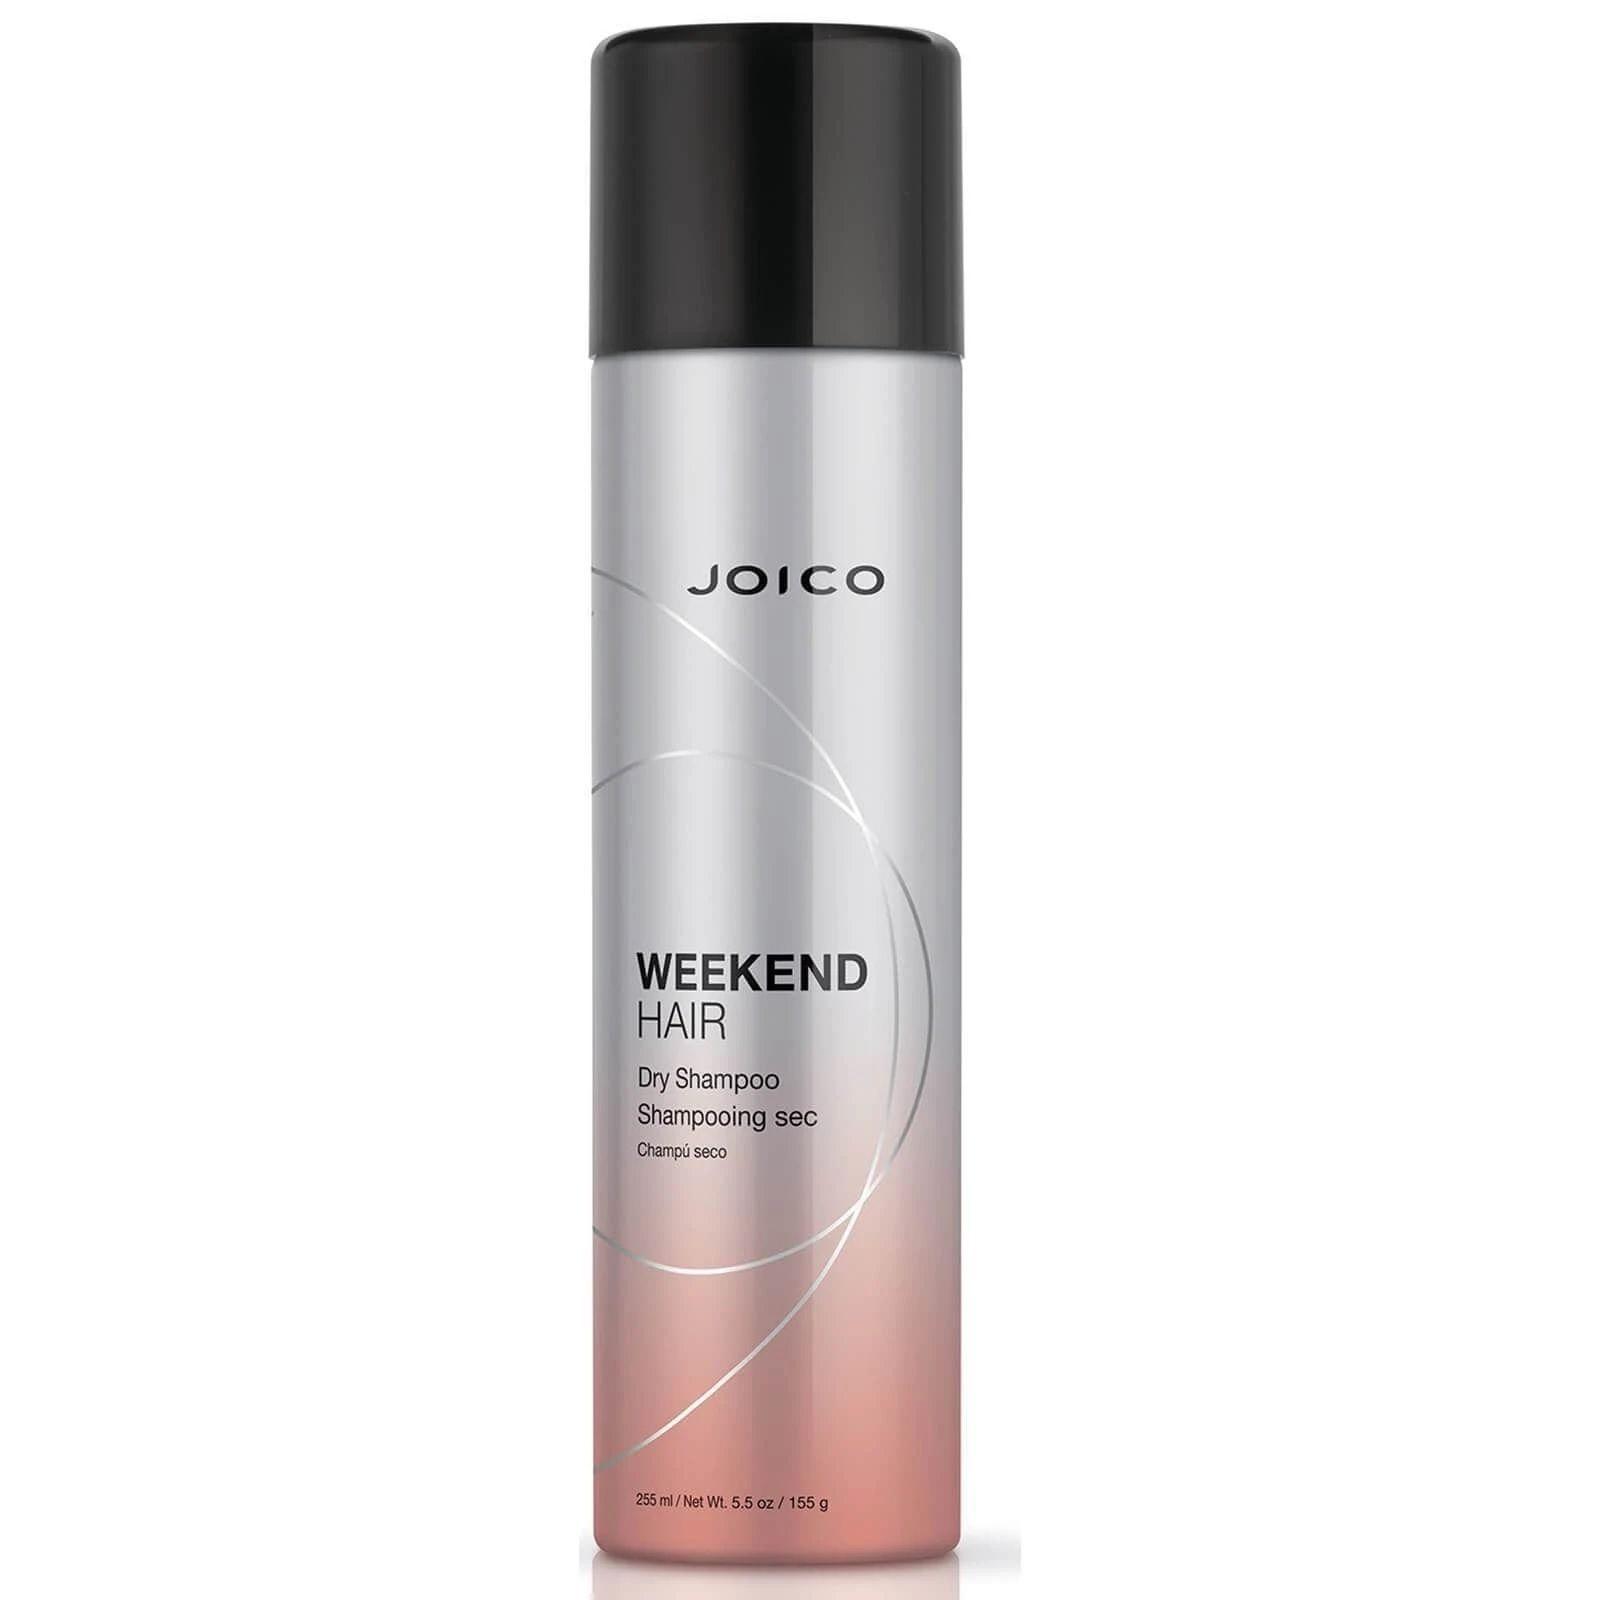 Joico Weekend Hair Dry Shampoo - 255ml